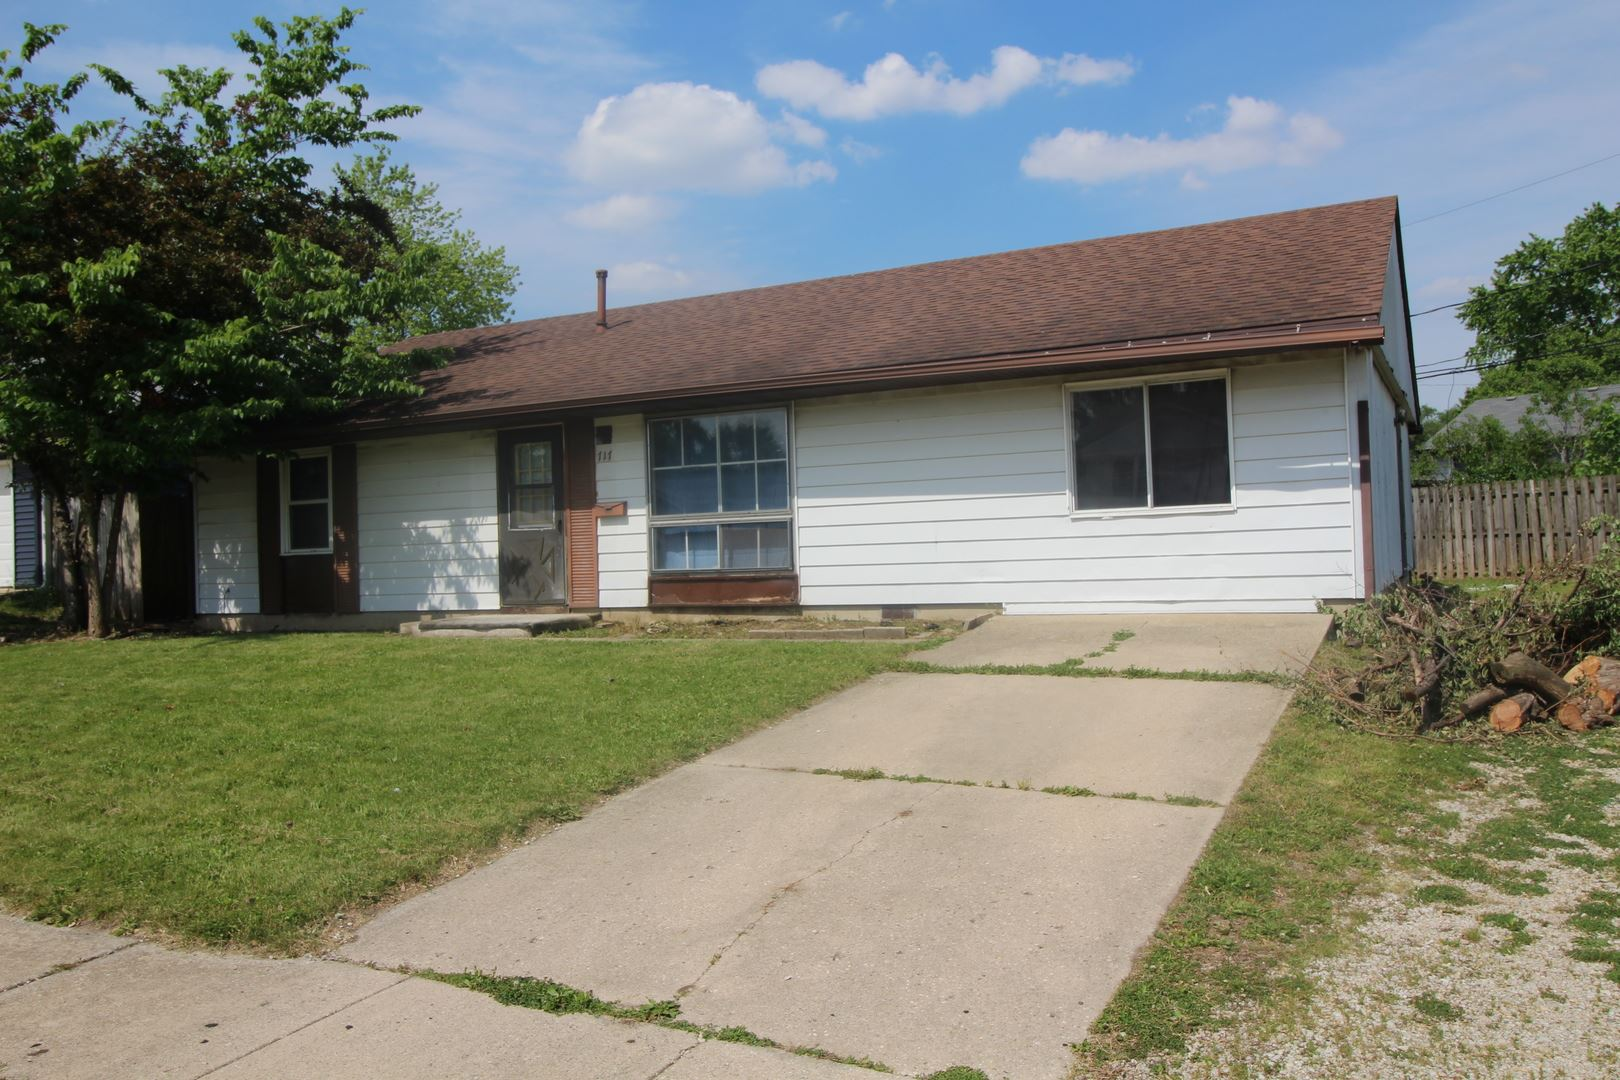 Photo of 717 Dexter Avenue, Romeoville, IL 60446 (MLS # 11126497)